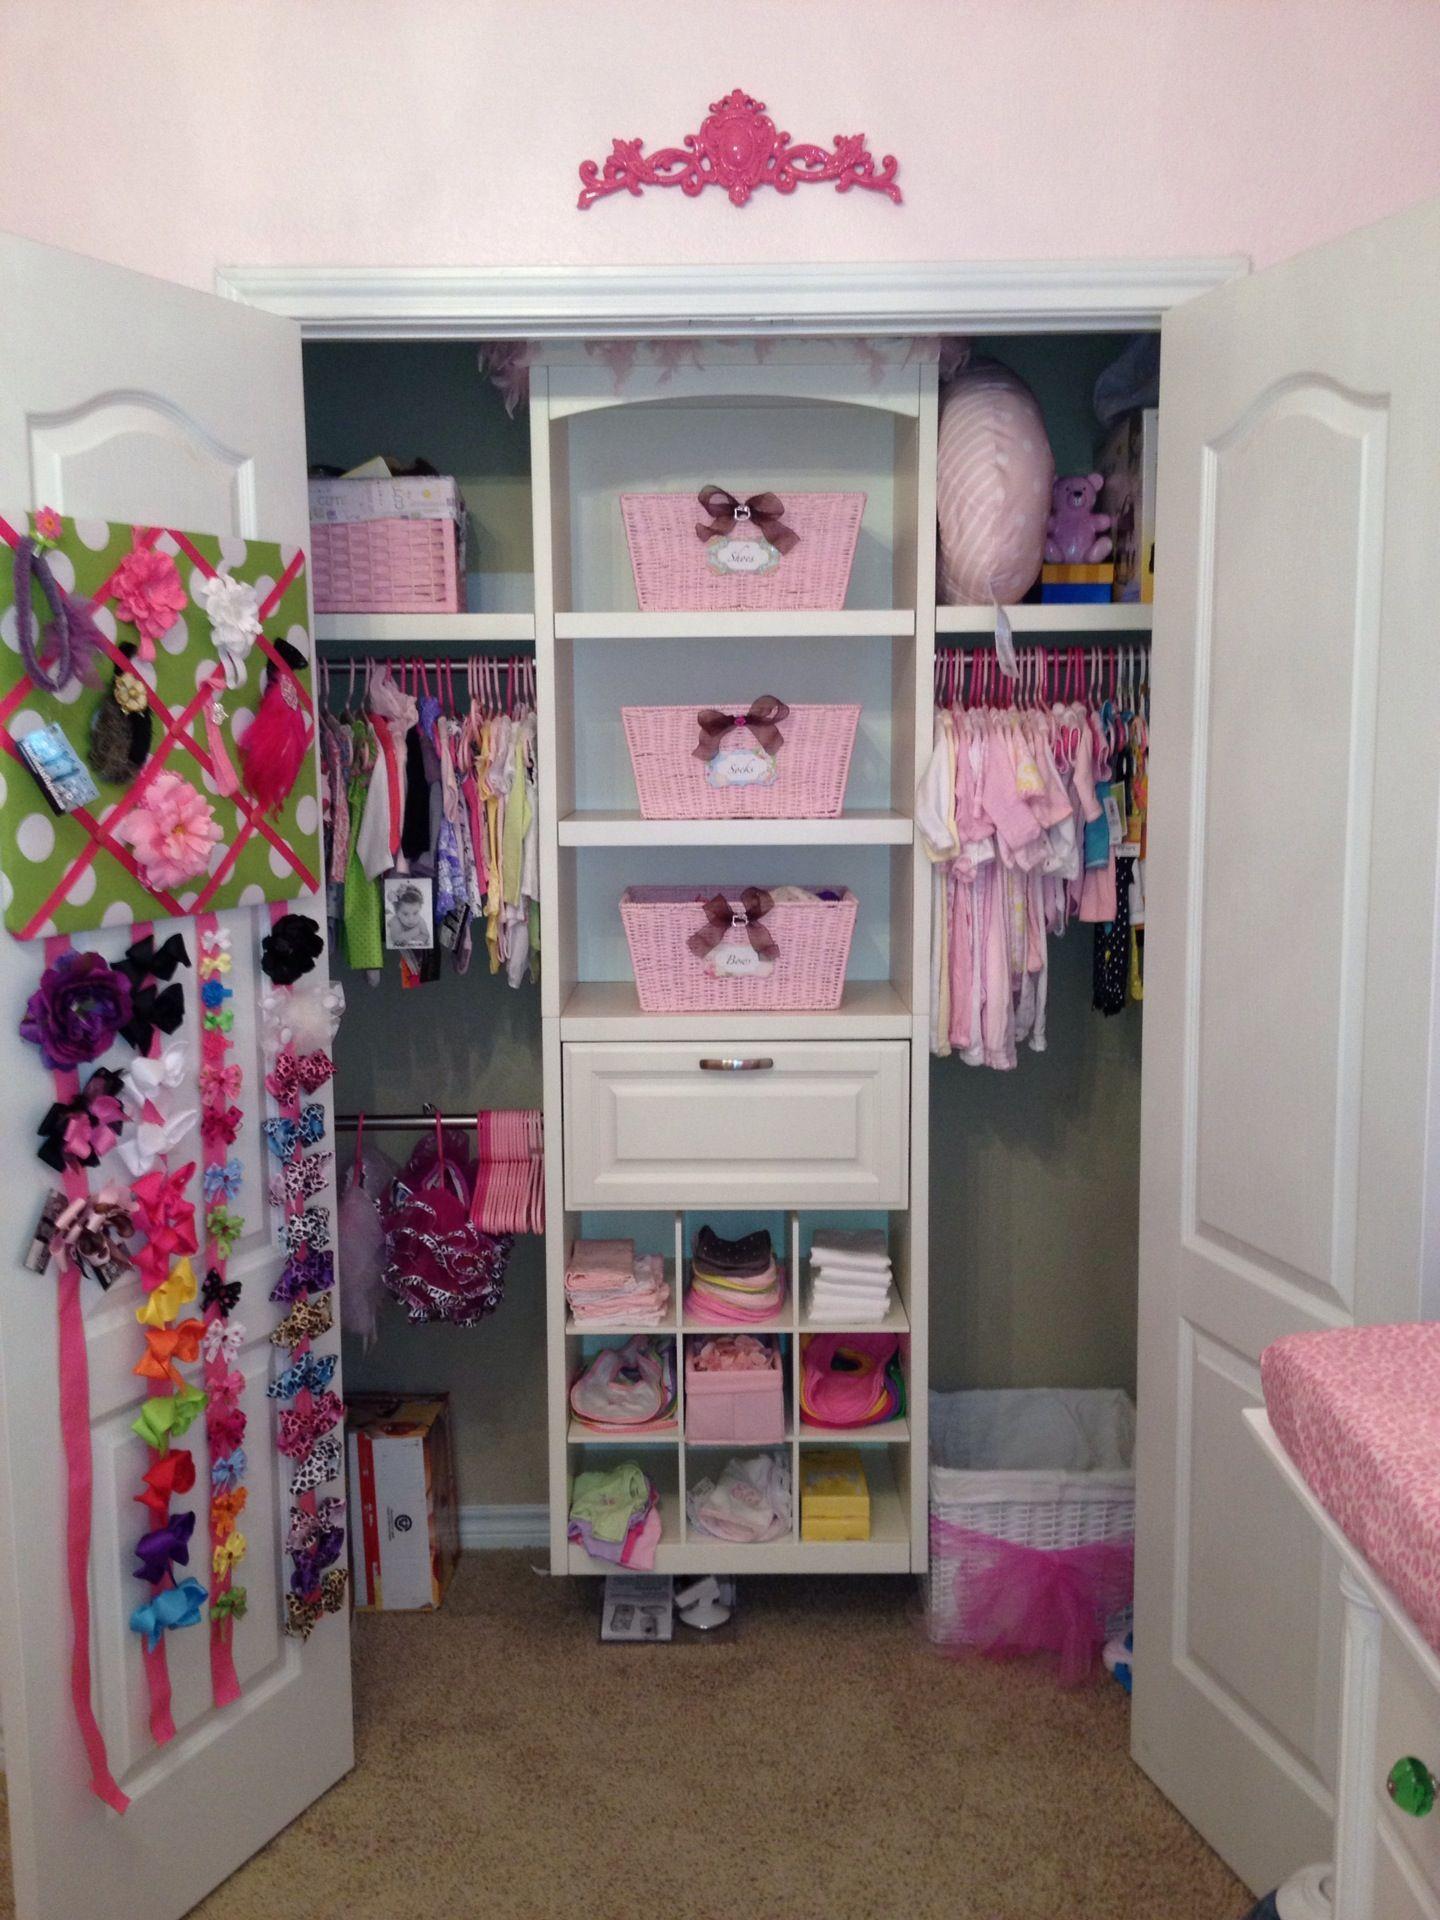 Mo os en las puertas del closet ideas swett home for Ideas para puertas de closet